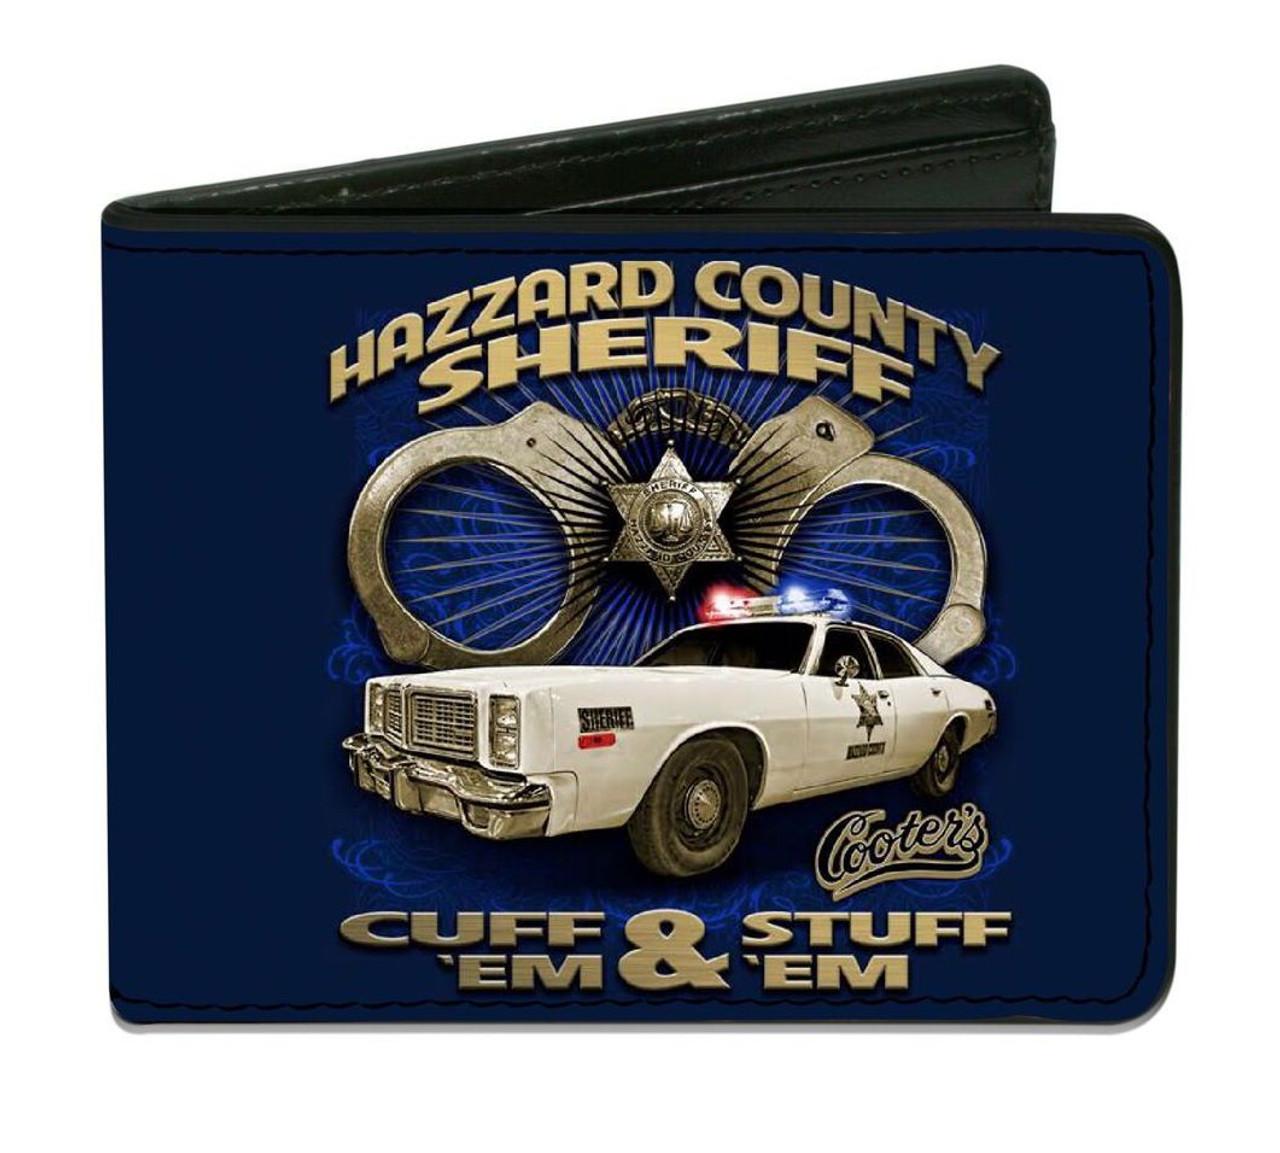 Hazzard County Sheriff Wallet